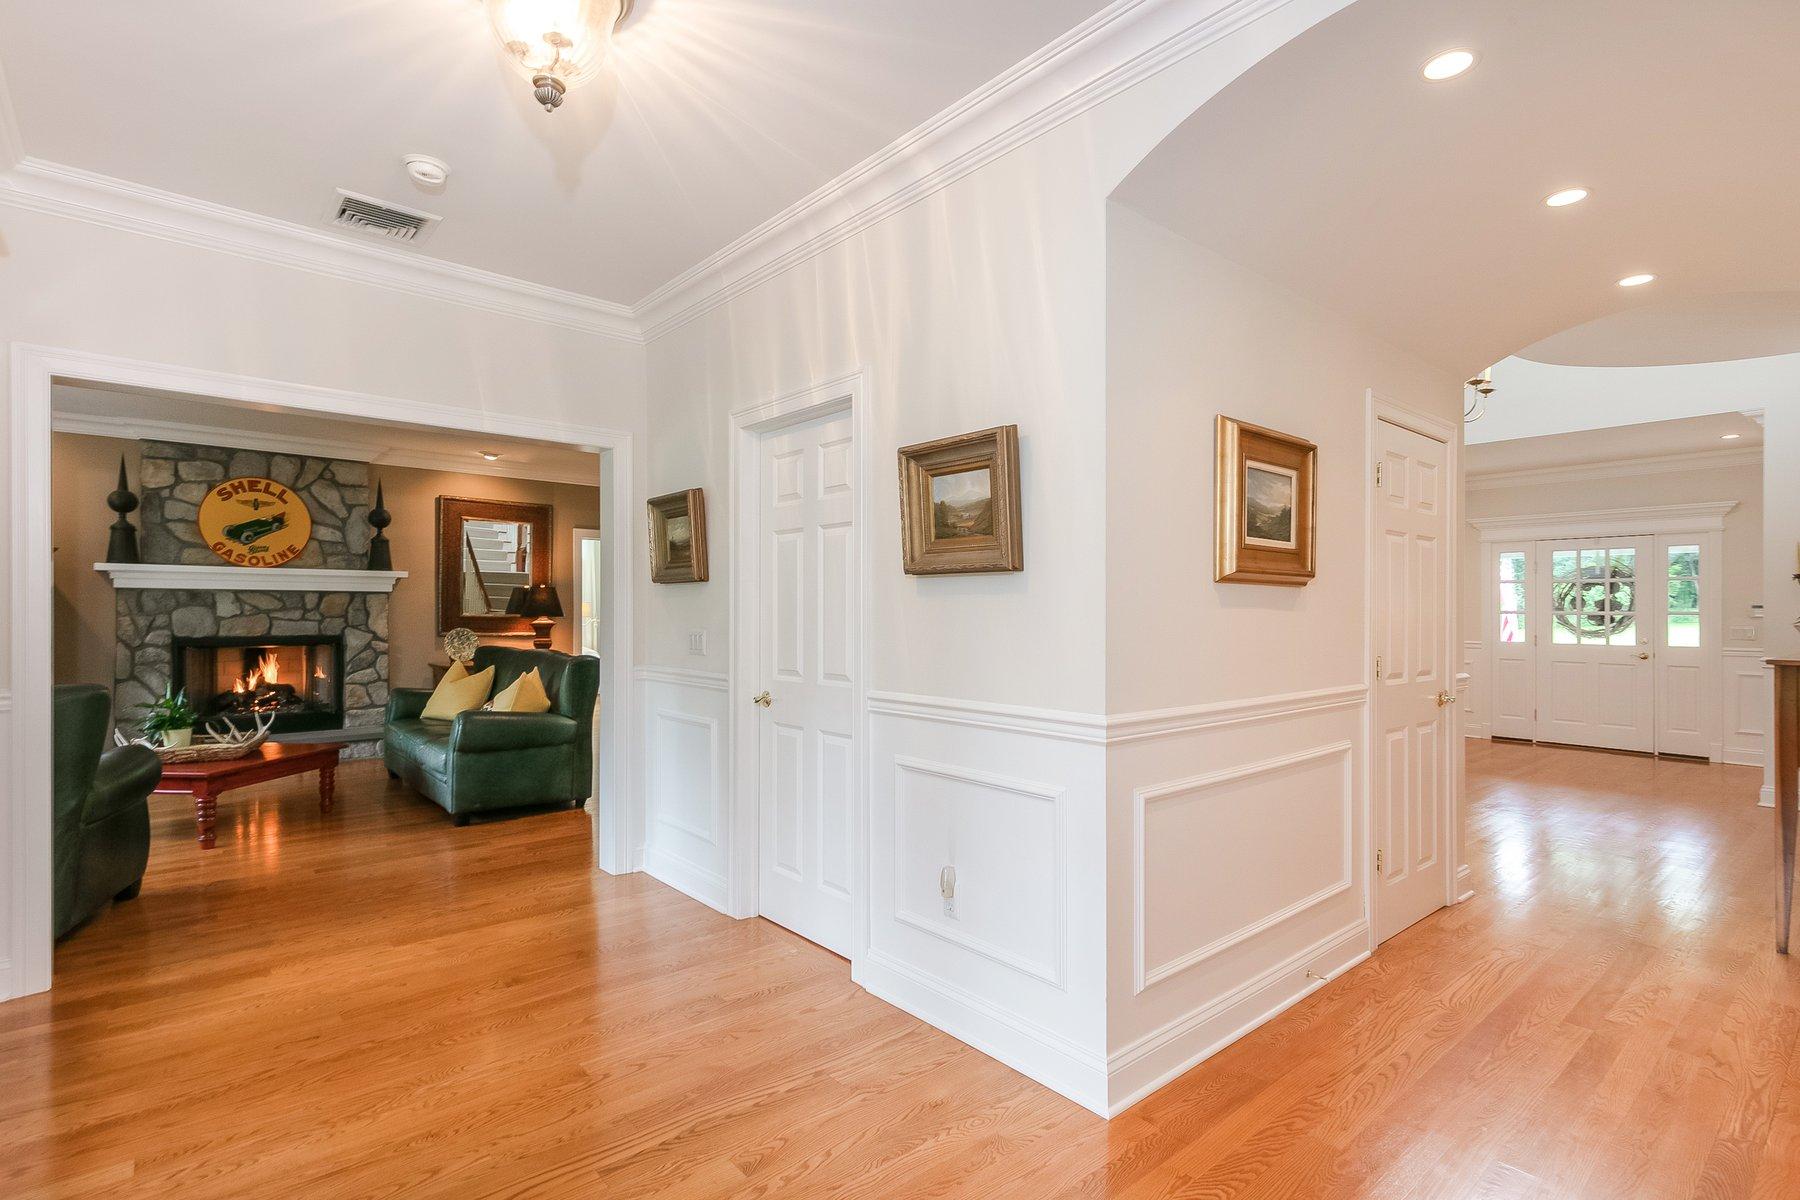 Additional photo for property listing at Warwick Meadows 57 Newport Bridge Road Warwick, New York 10990 United States